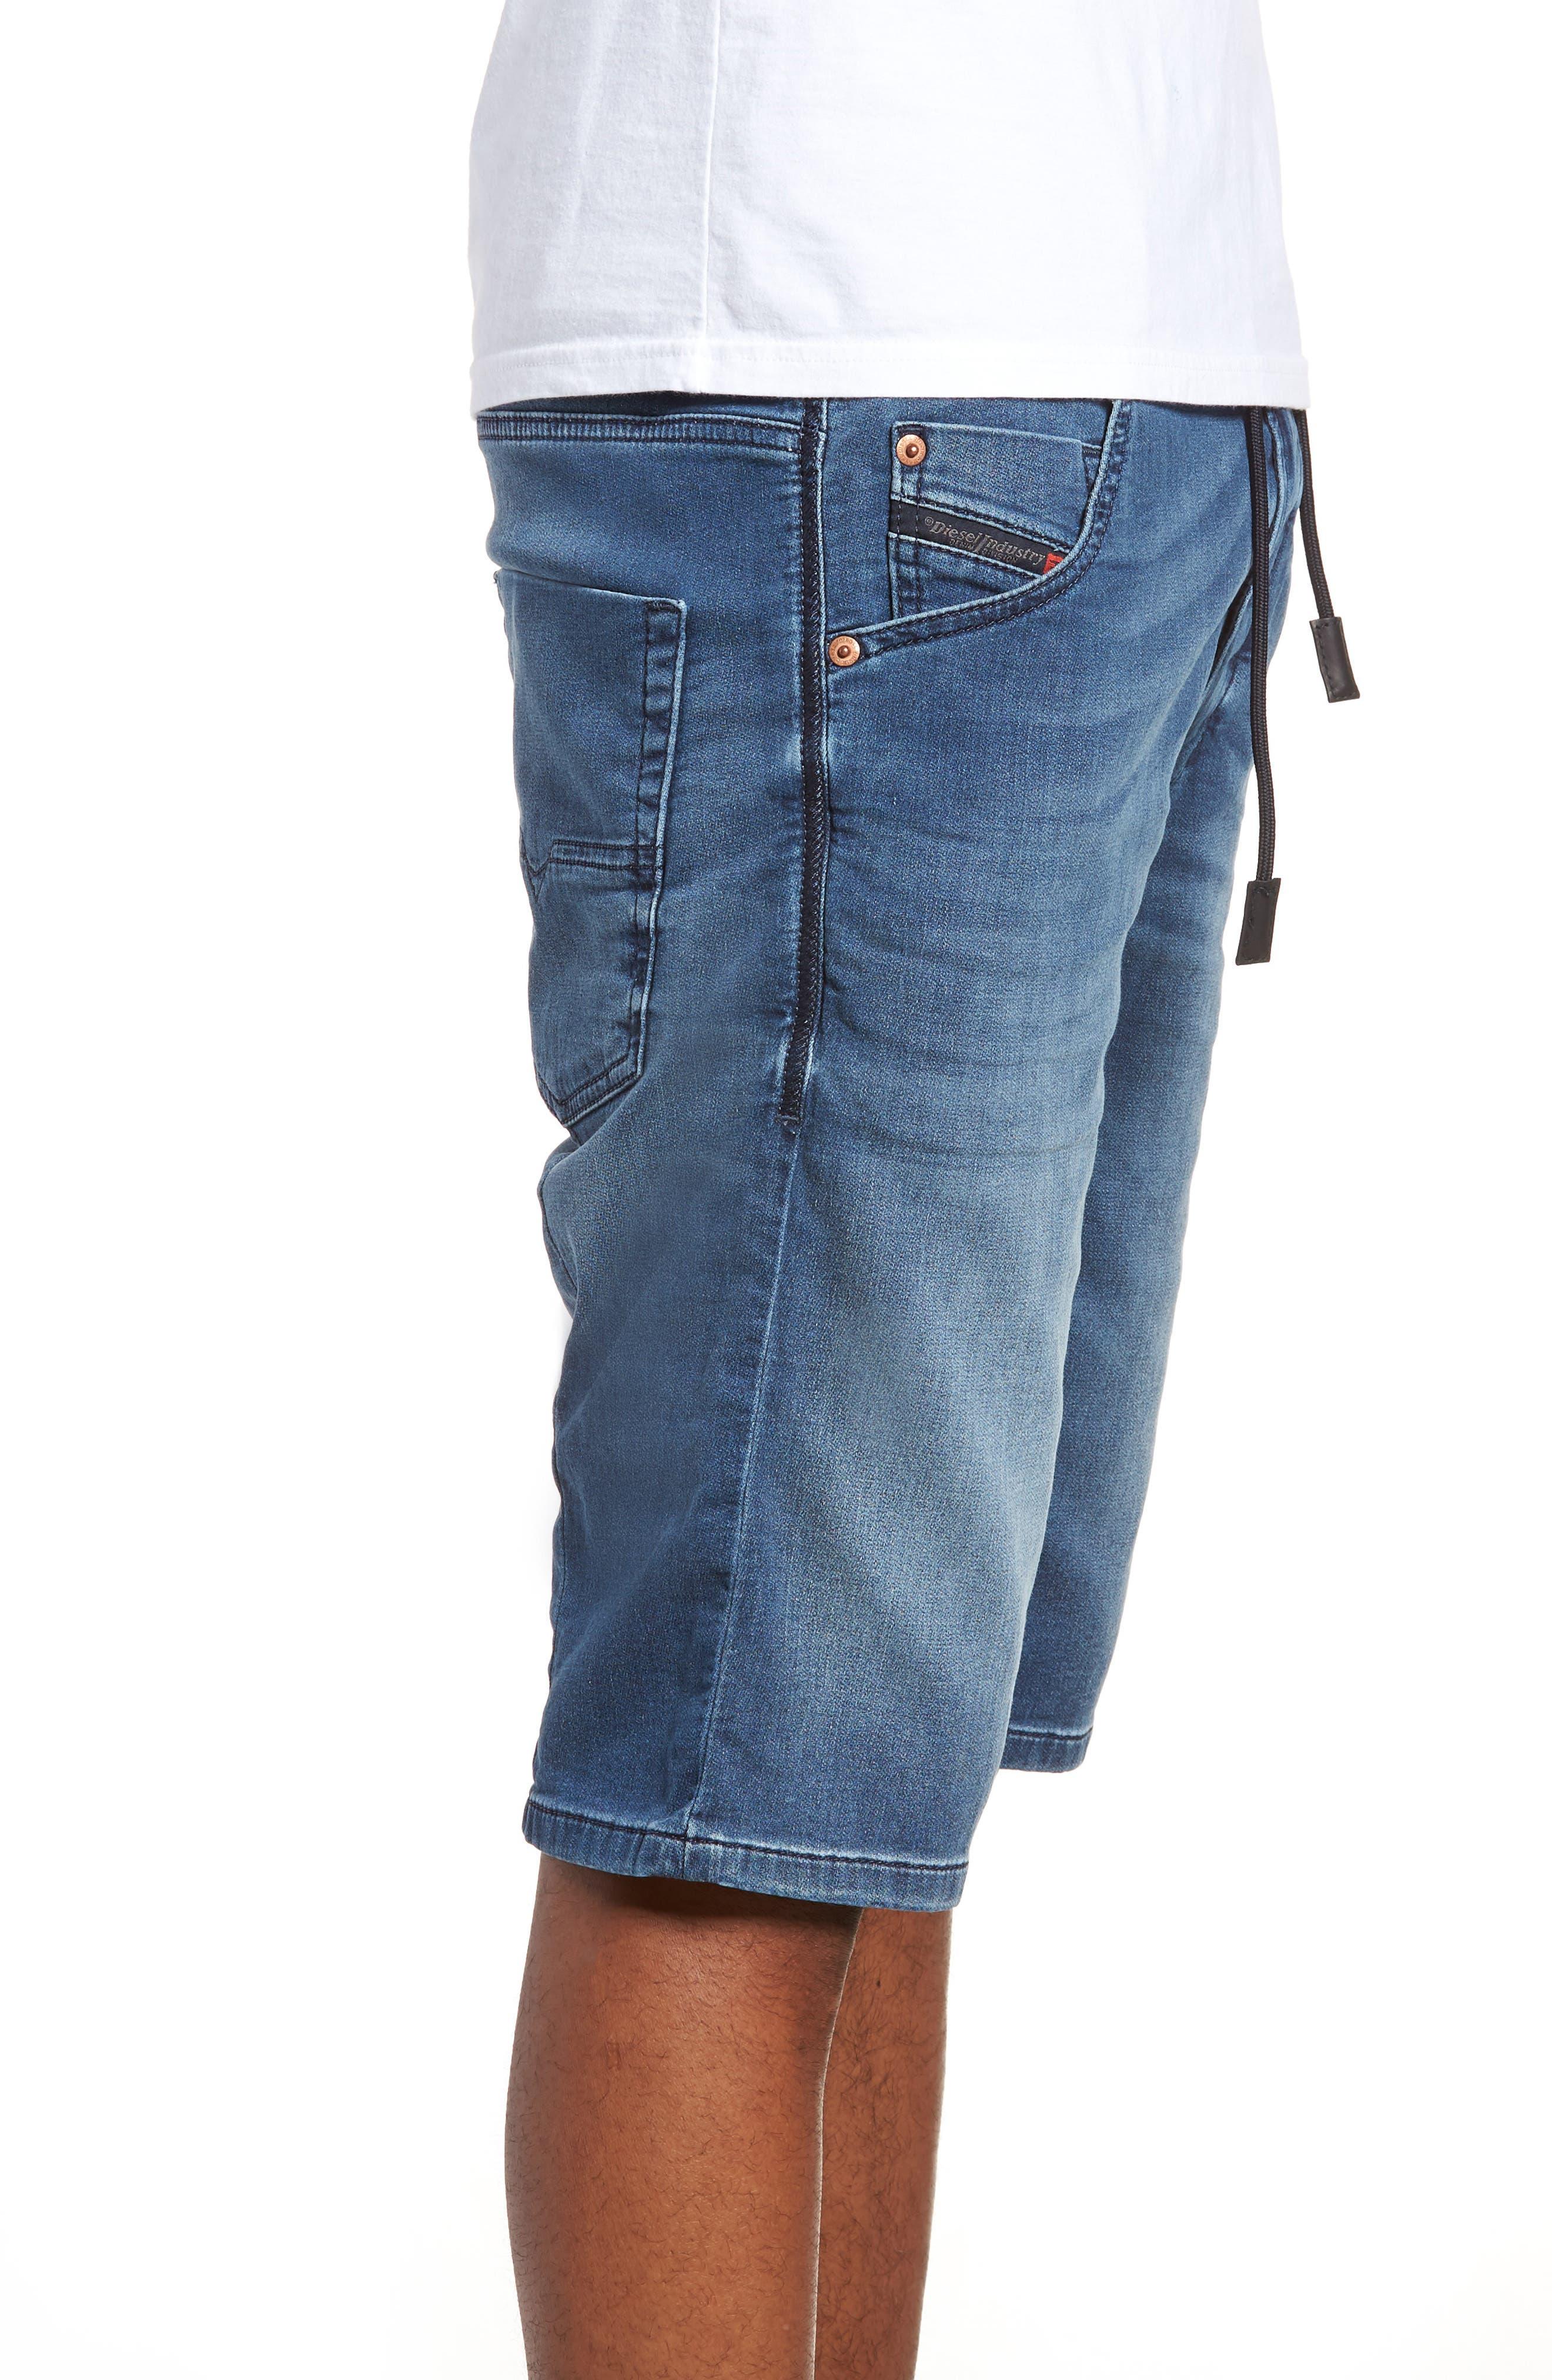 Krooshort Denim Shorts,                             Alternate thumbnail 3, color,                             0687C